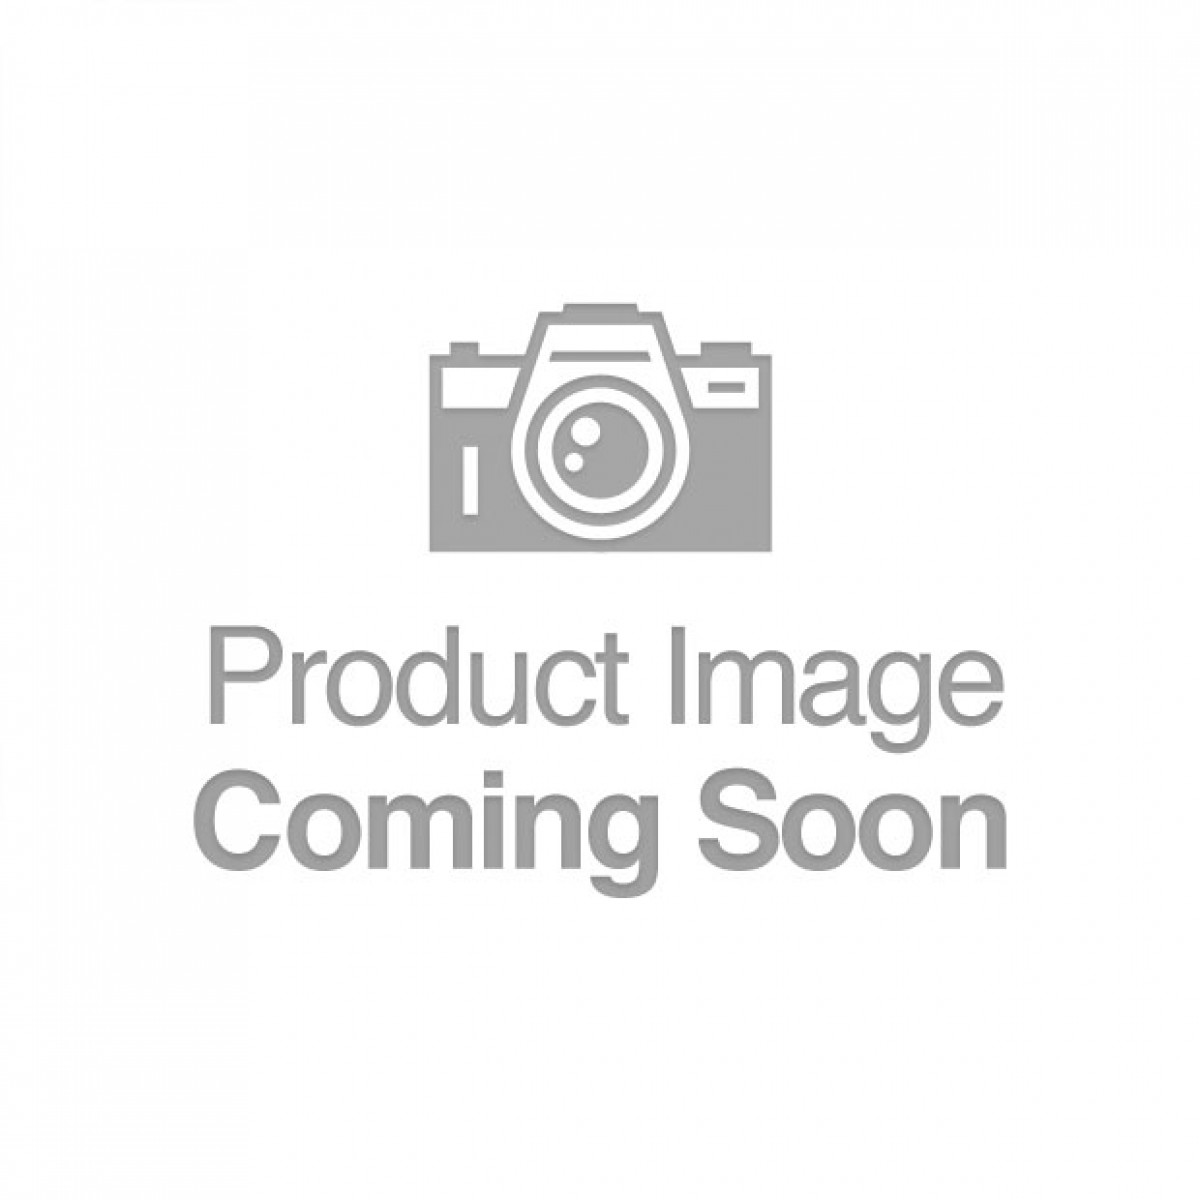 Dragon Alkaline Batteries - AG13/LR44 Pack of 10